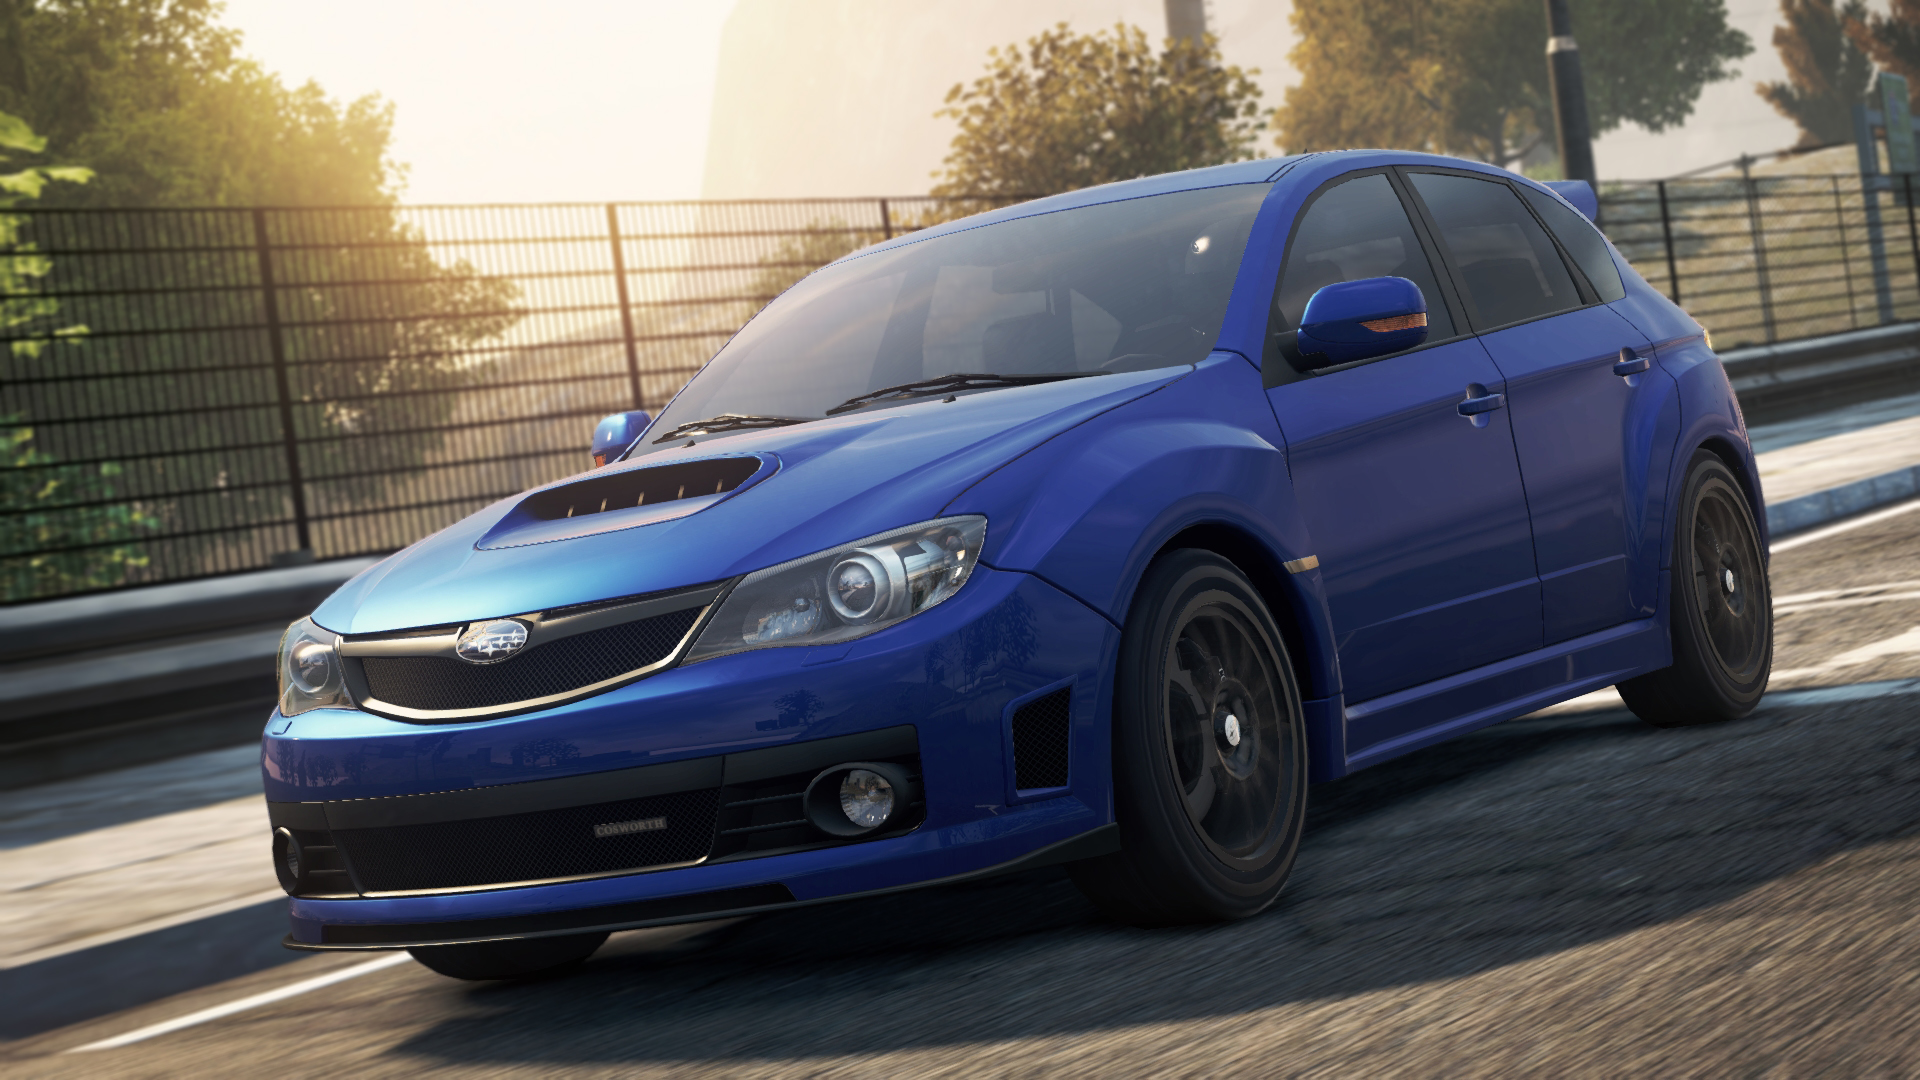 Subaru Cosworth Impreza STI CS400 | Need for Speed Wiki | FANDOM ...